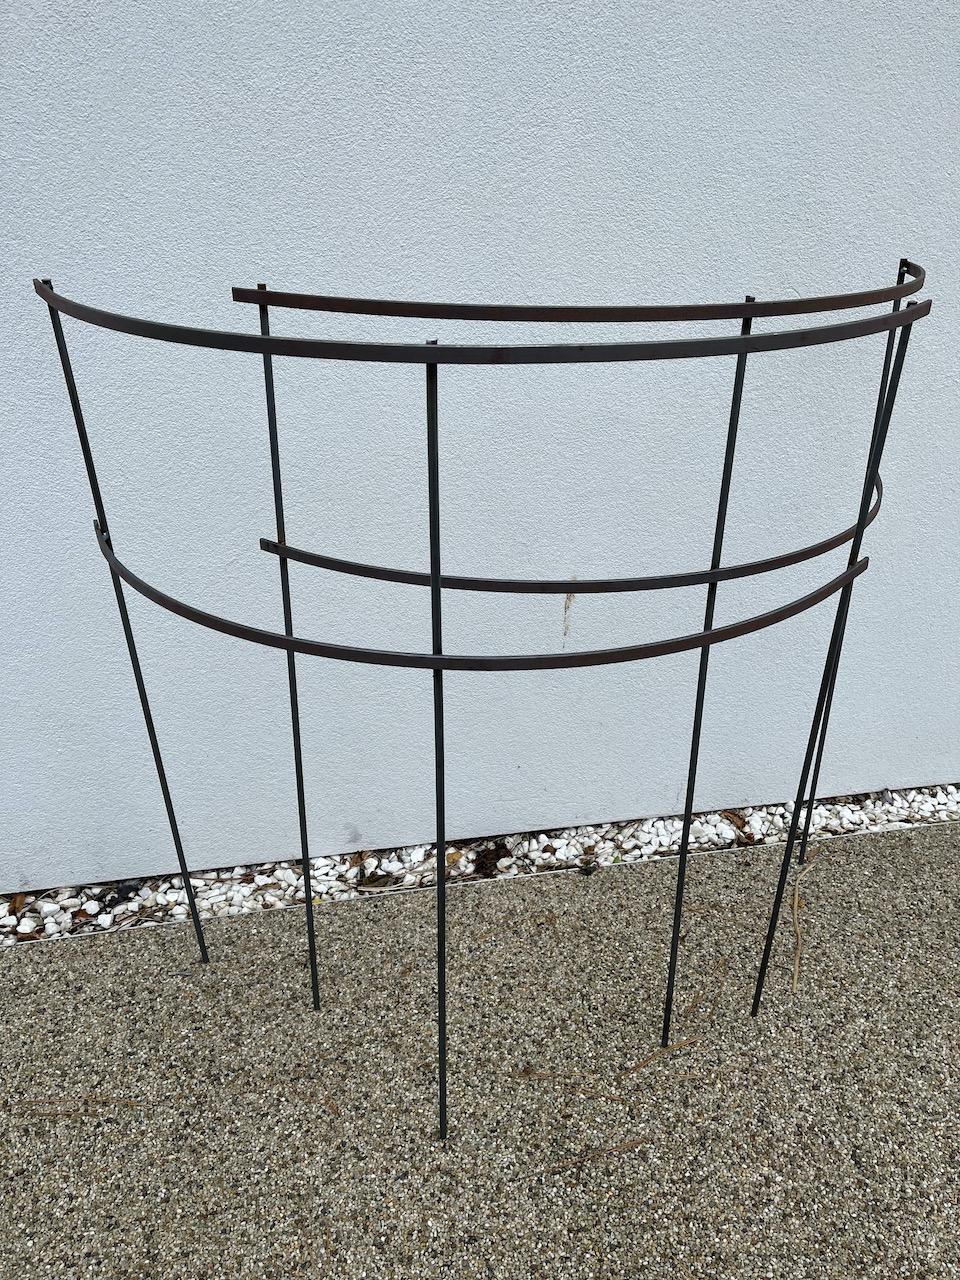 Basic Plant Support Half Round - The Gardeners Blacksmith - Jonne Ceserani